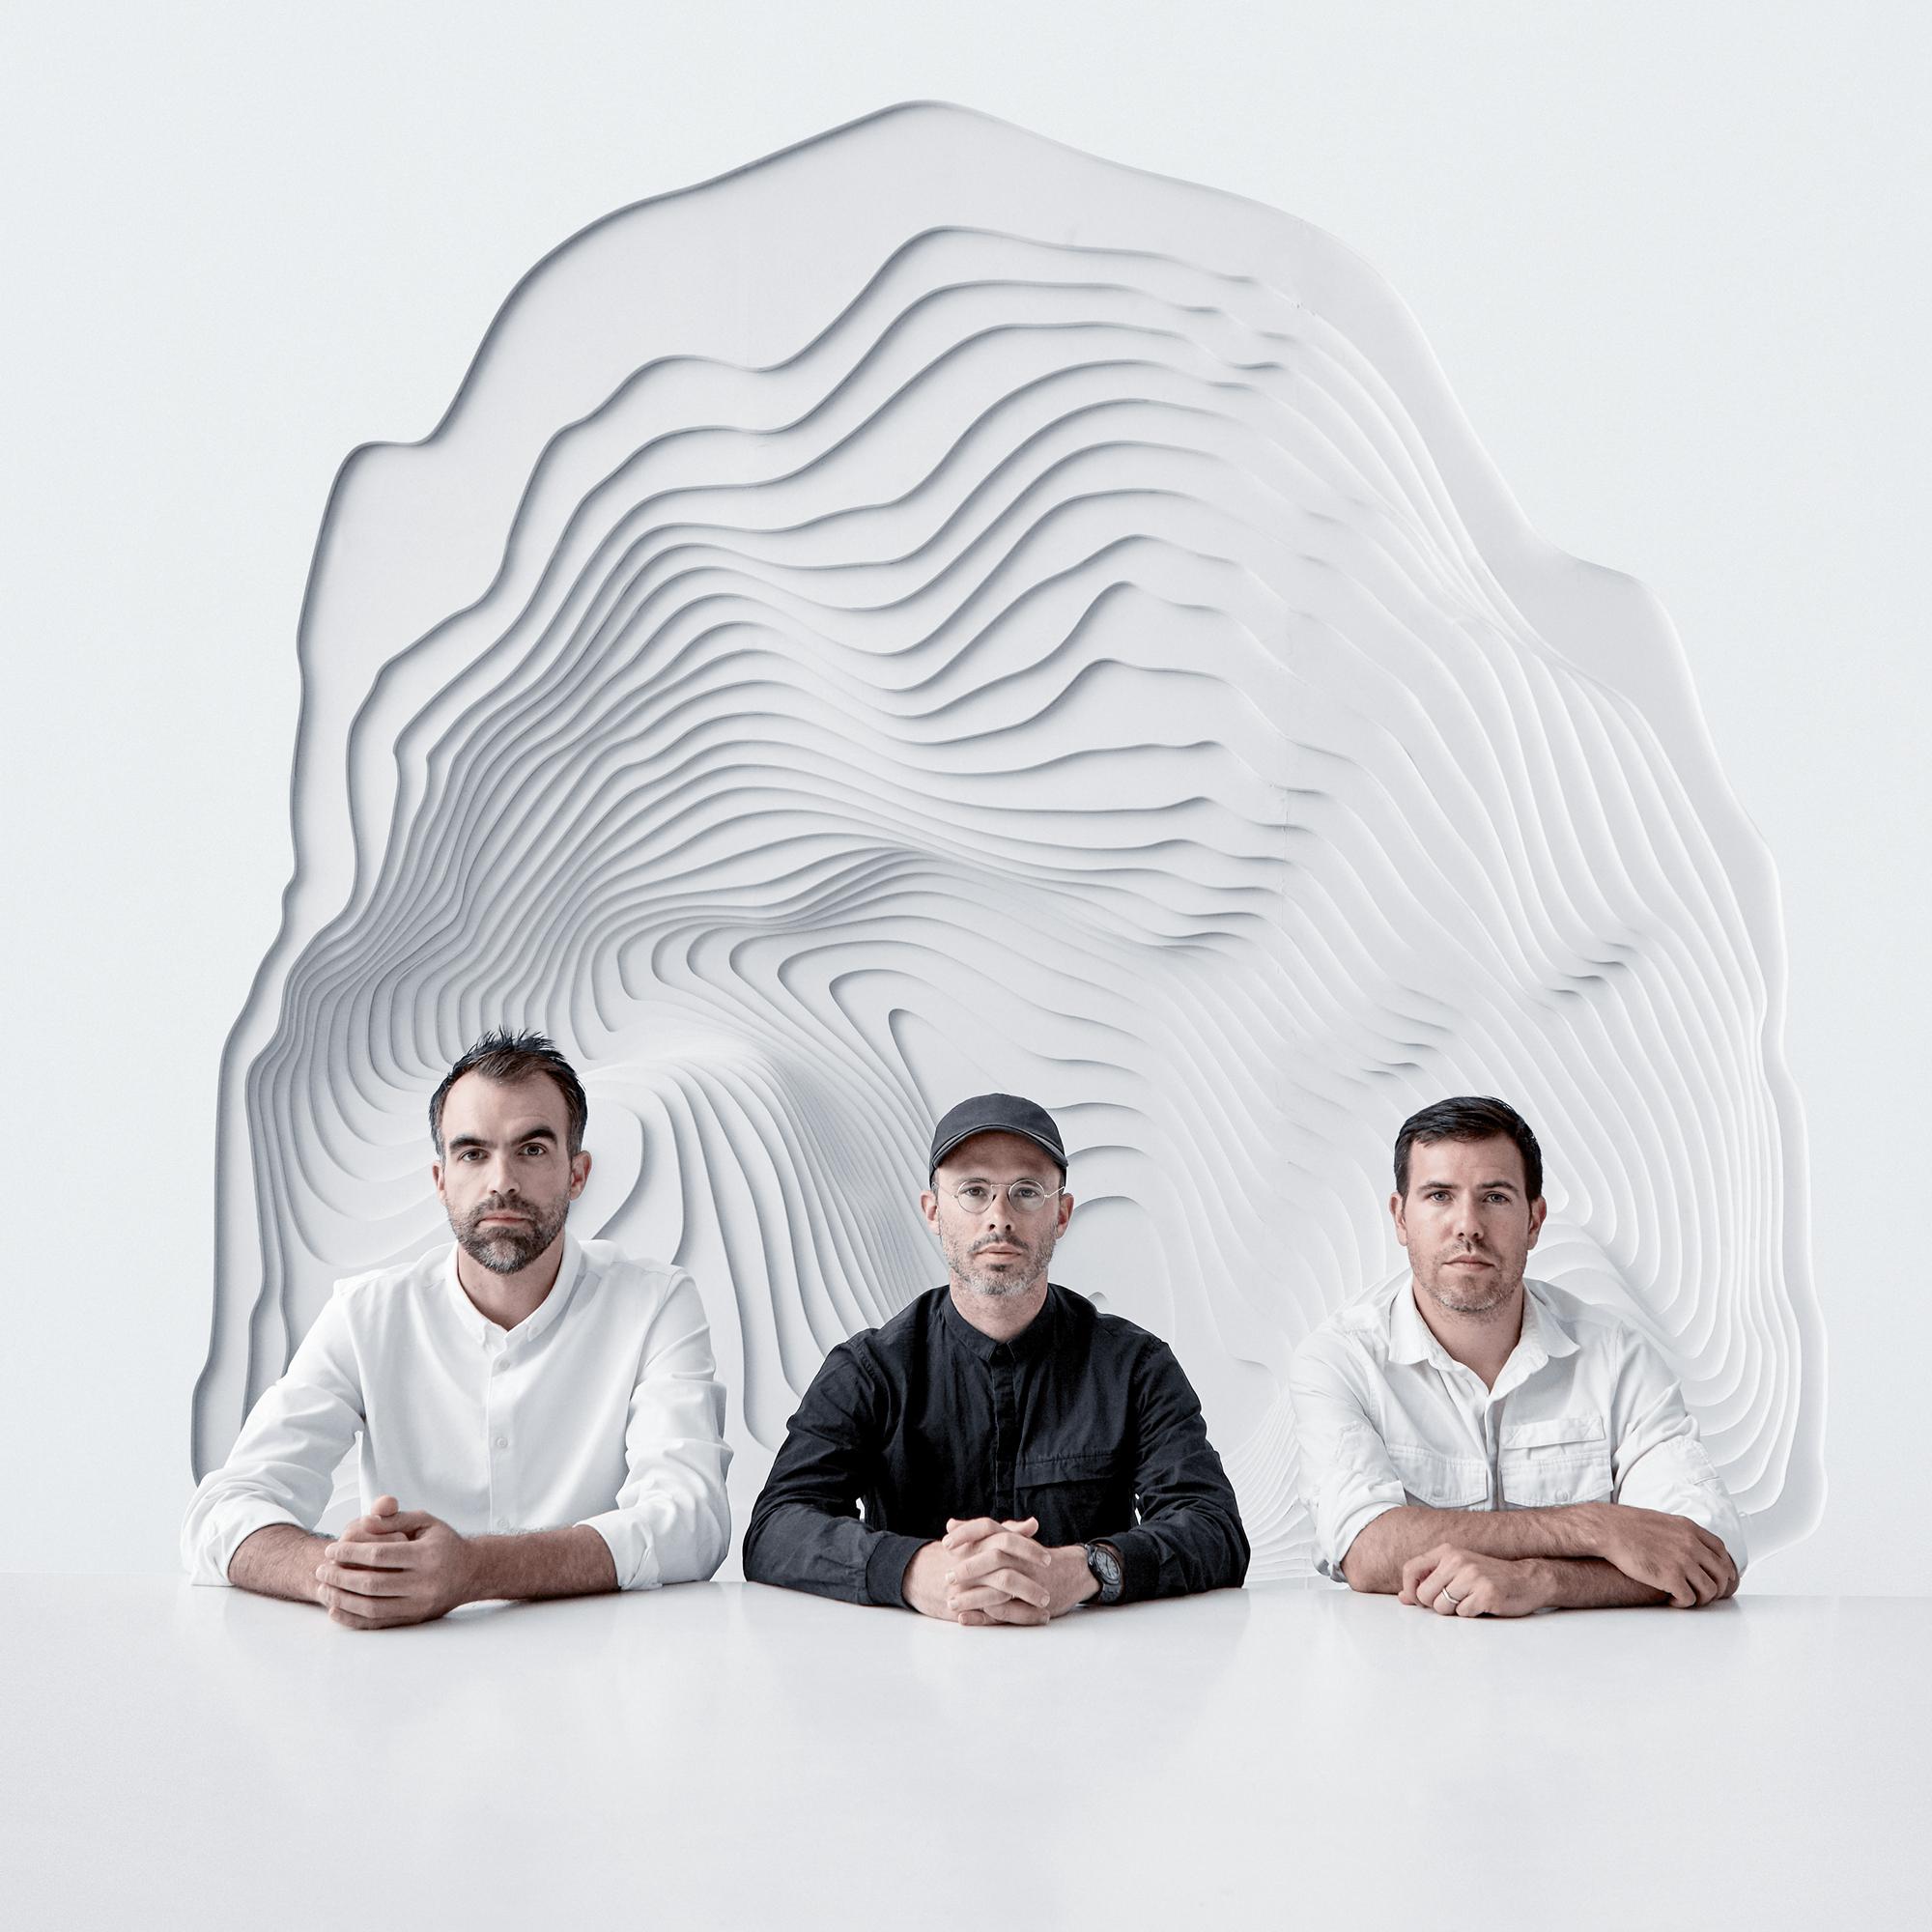 Alex Mustonen, Daniel Arsham, Ben Porto